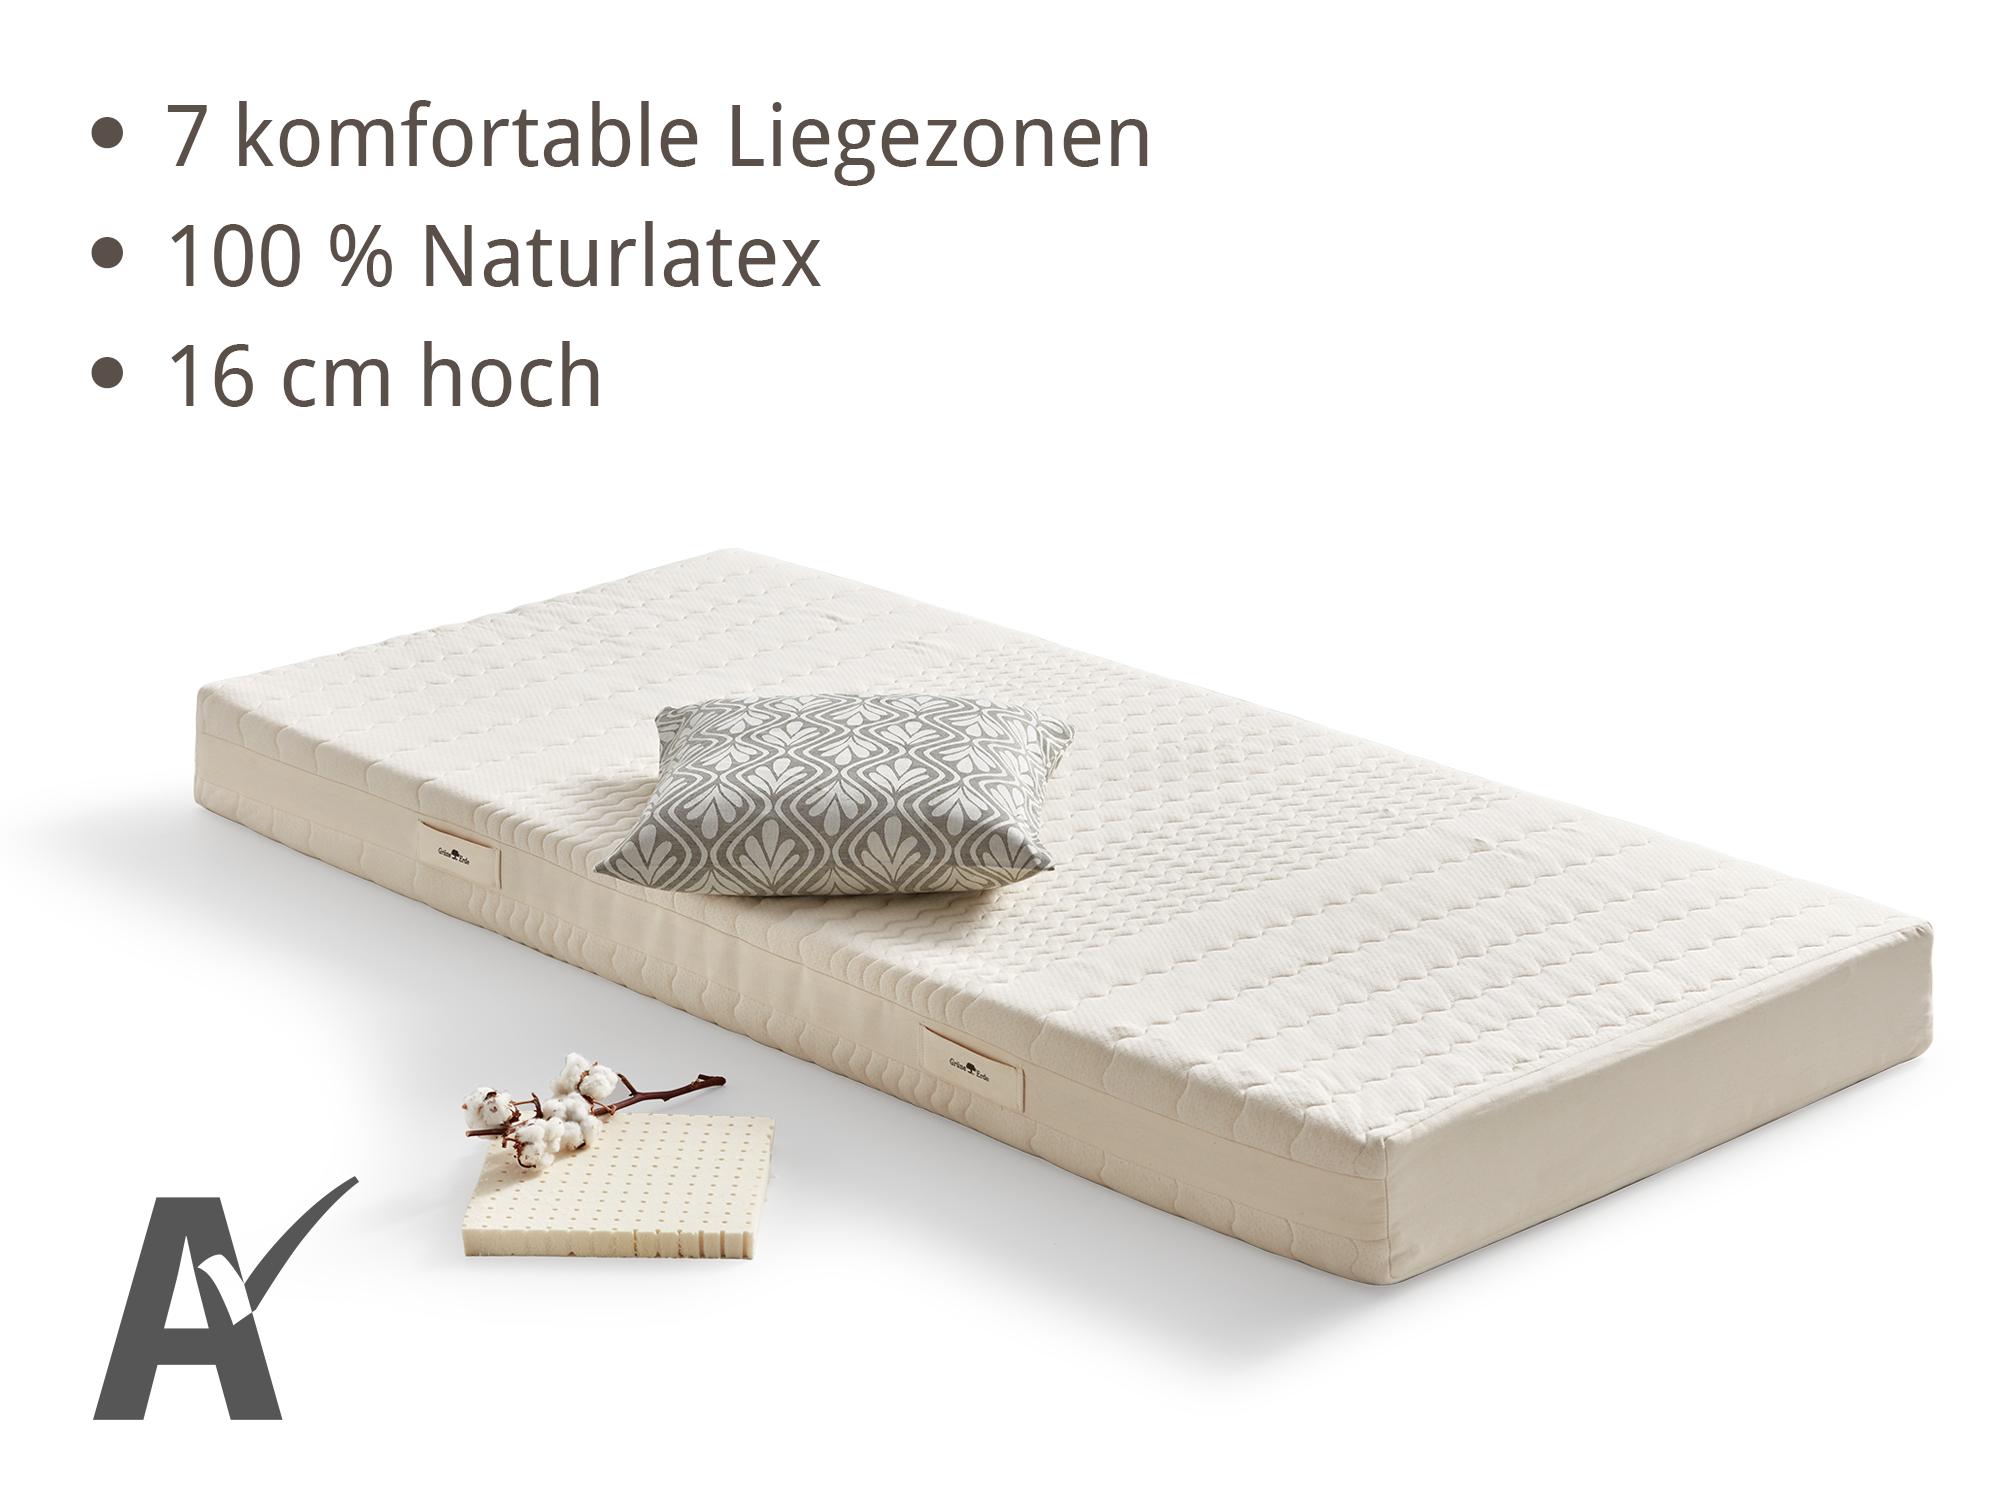 rona s wolke 7 komfortable liegezonen gr ne erde. Black Bedroom Furniture Sets. Home Design Ideas